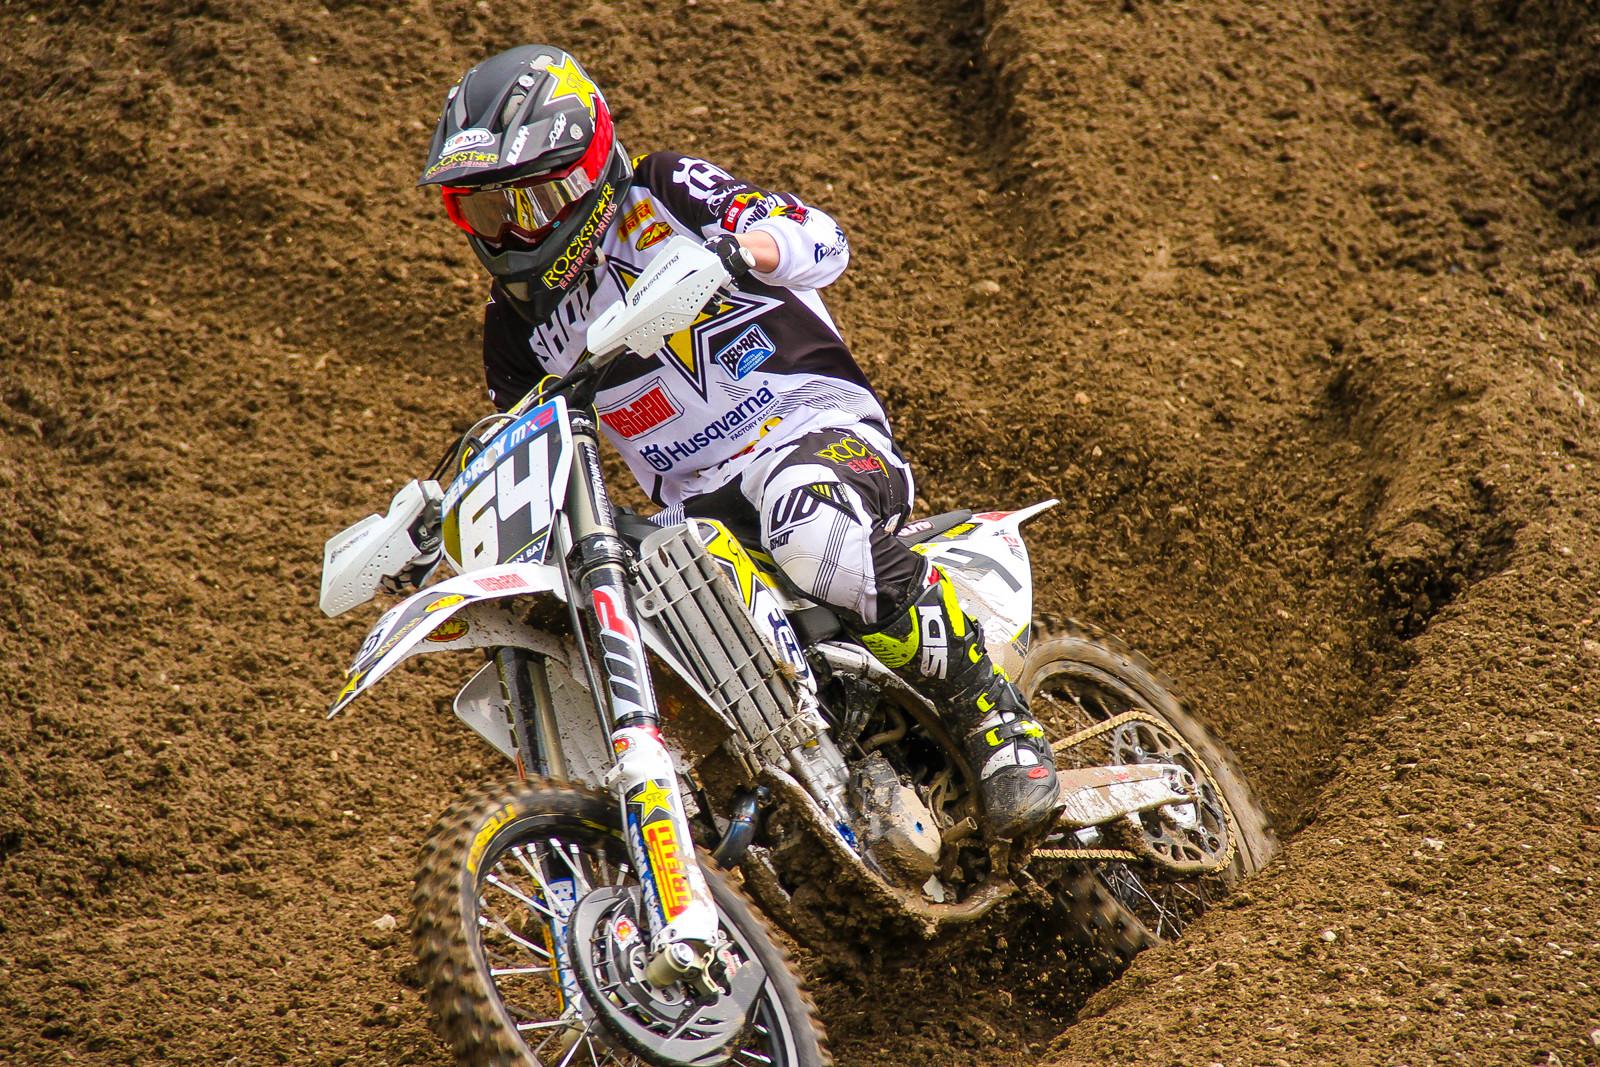 Thomas Covington - Photo Blast: 2017 MXGP of Trentino - Motocross Pictures - Vital MX